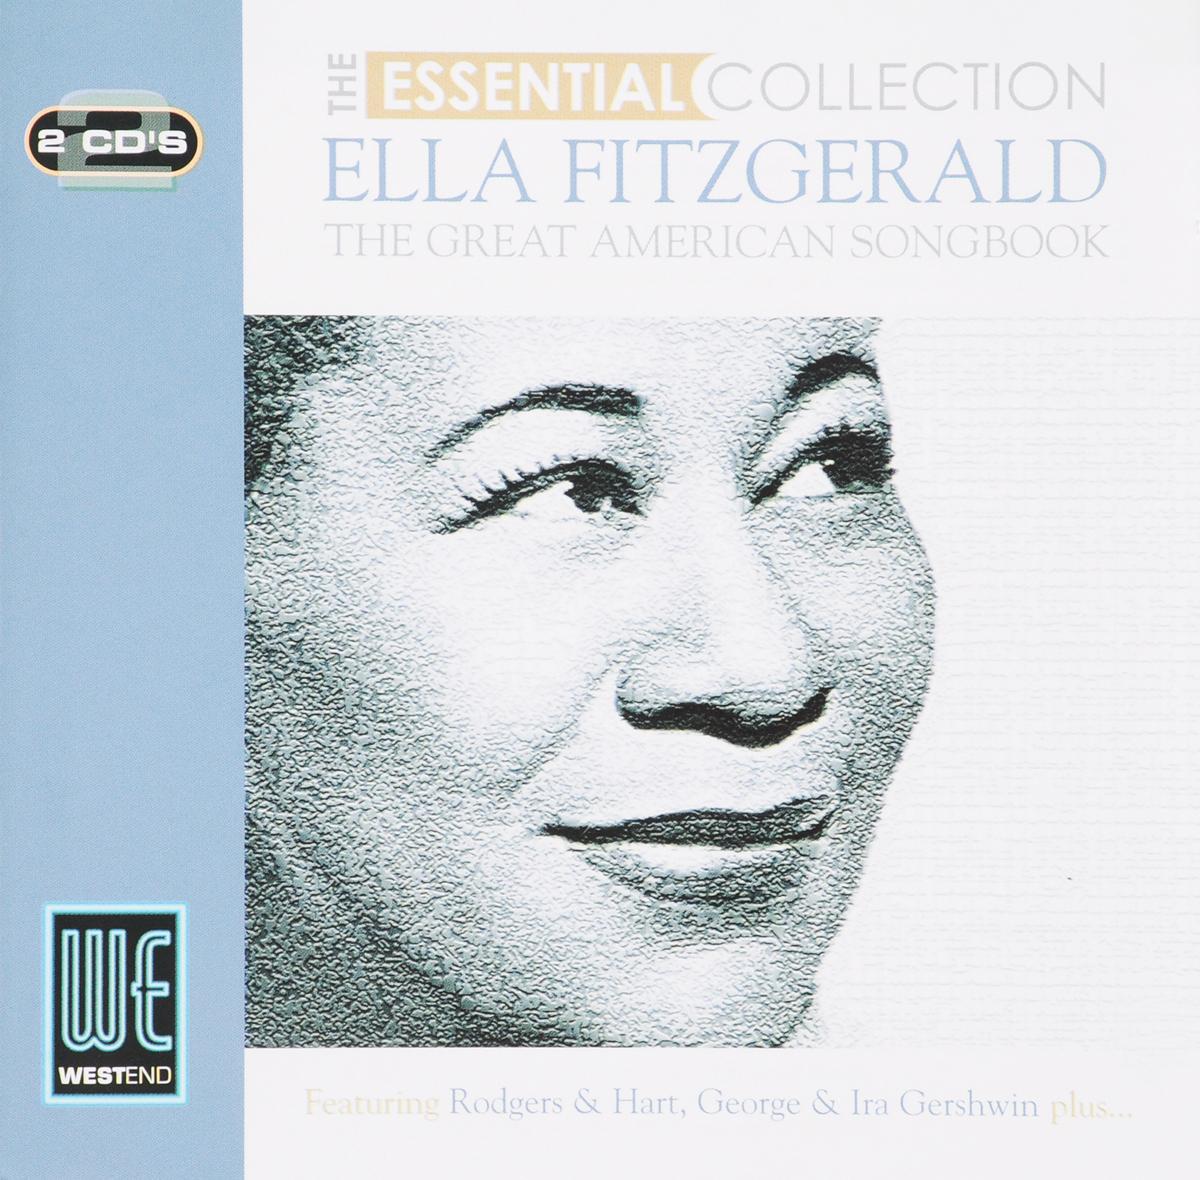 Элла Фитцжеральд Ella Fitzgerald. Great American Songbook the Essential Collection (2 CD) cd ella fitzgerald great american songbook